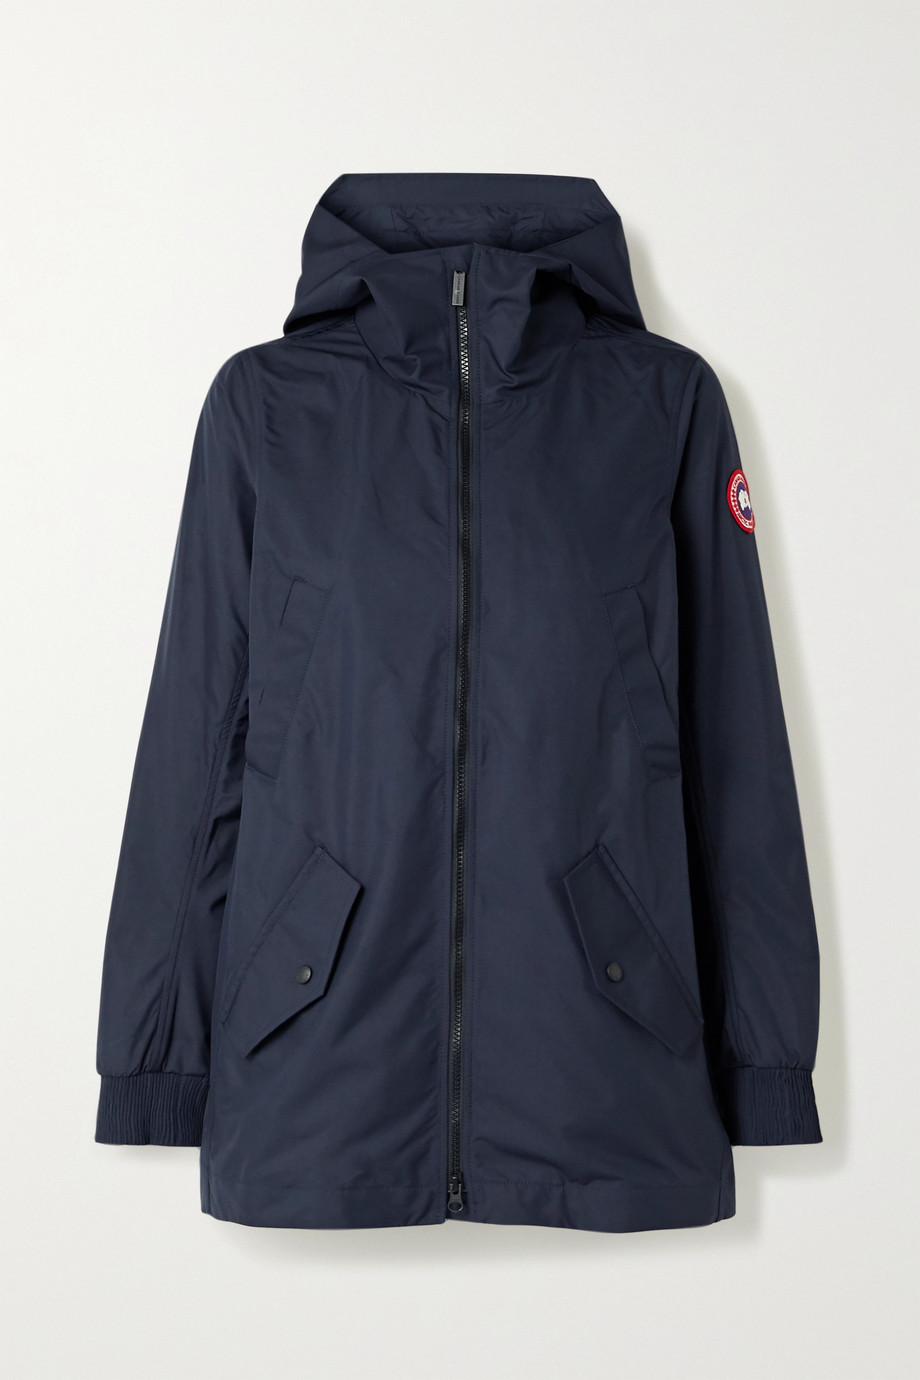 Canada Goose Ellscott hooded shell jacket